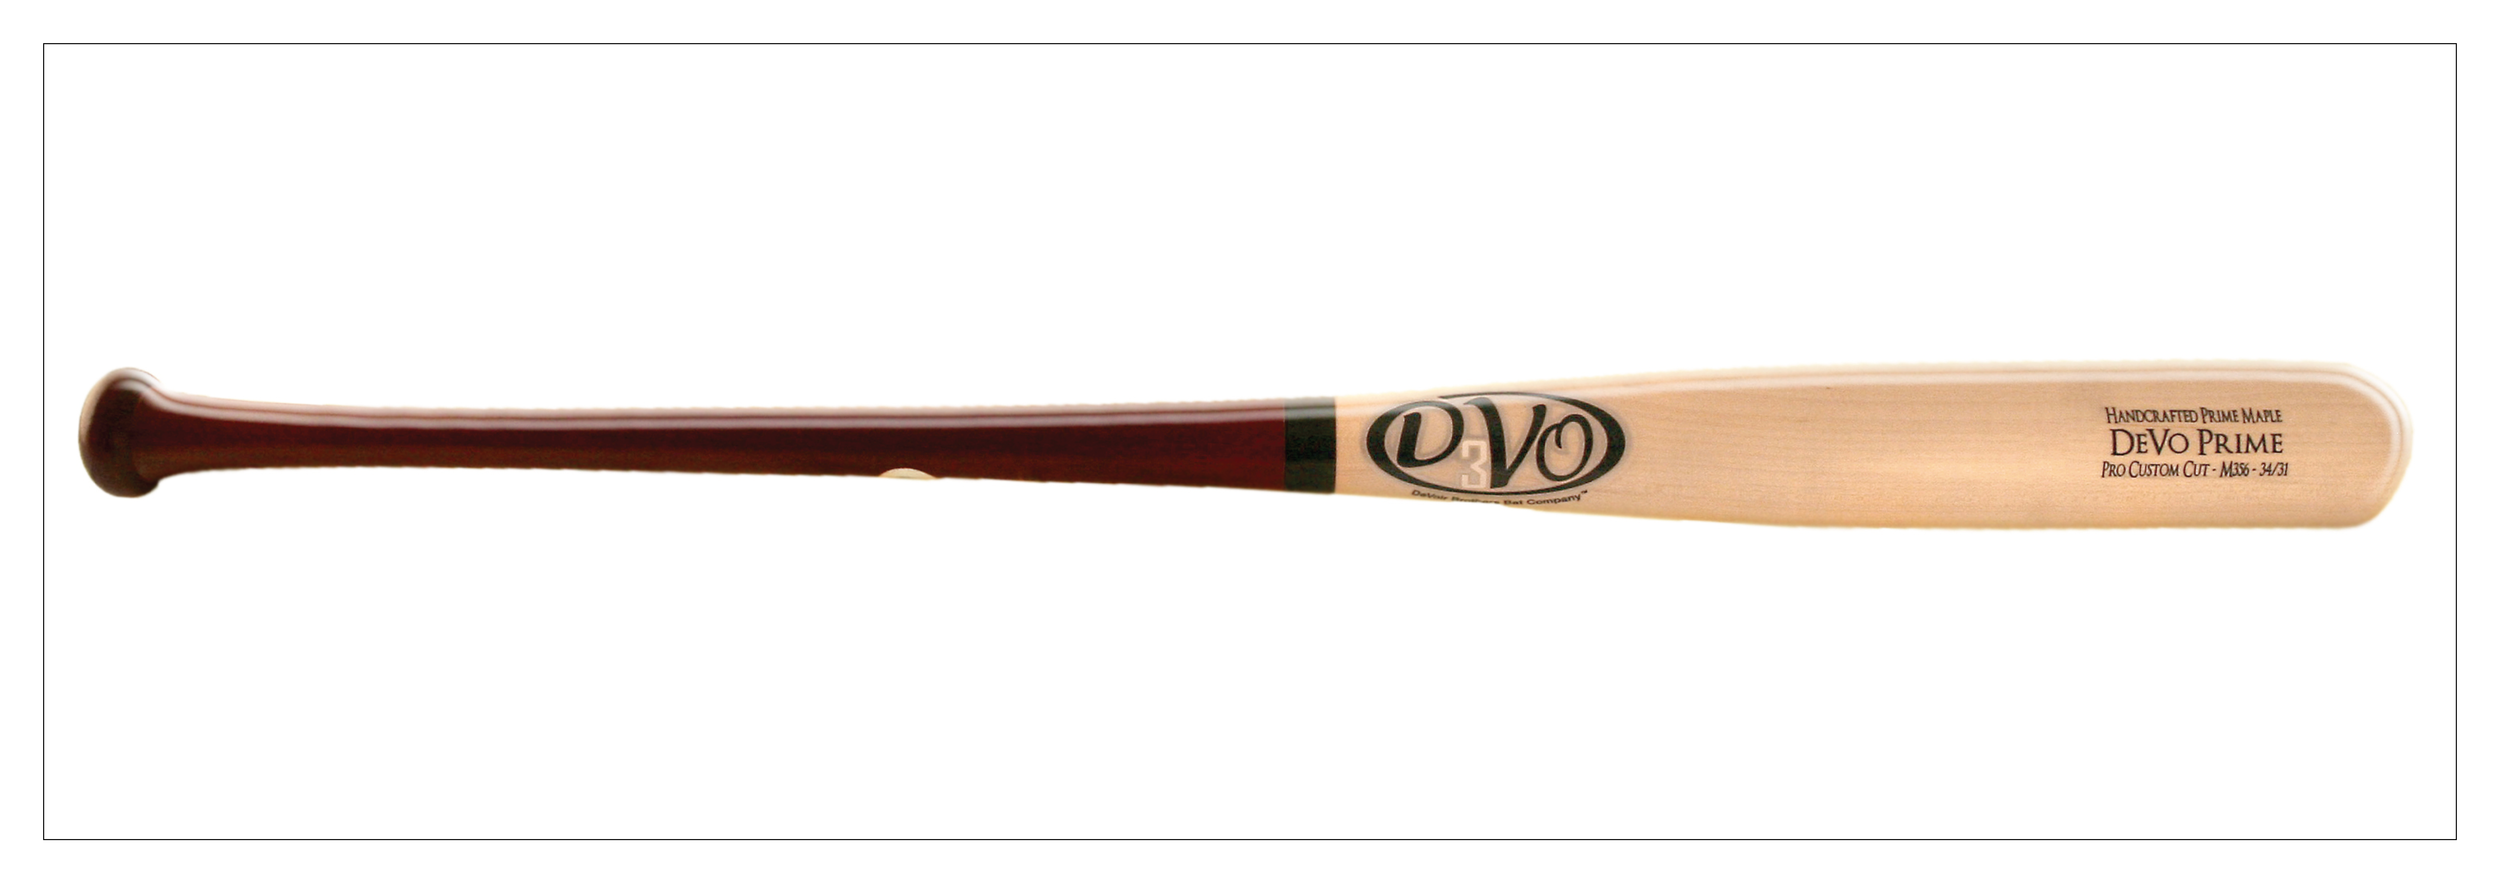 DeVo Bats M356_Single